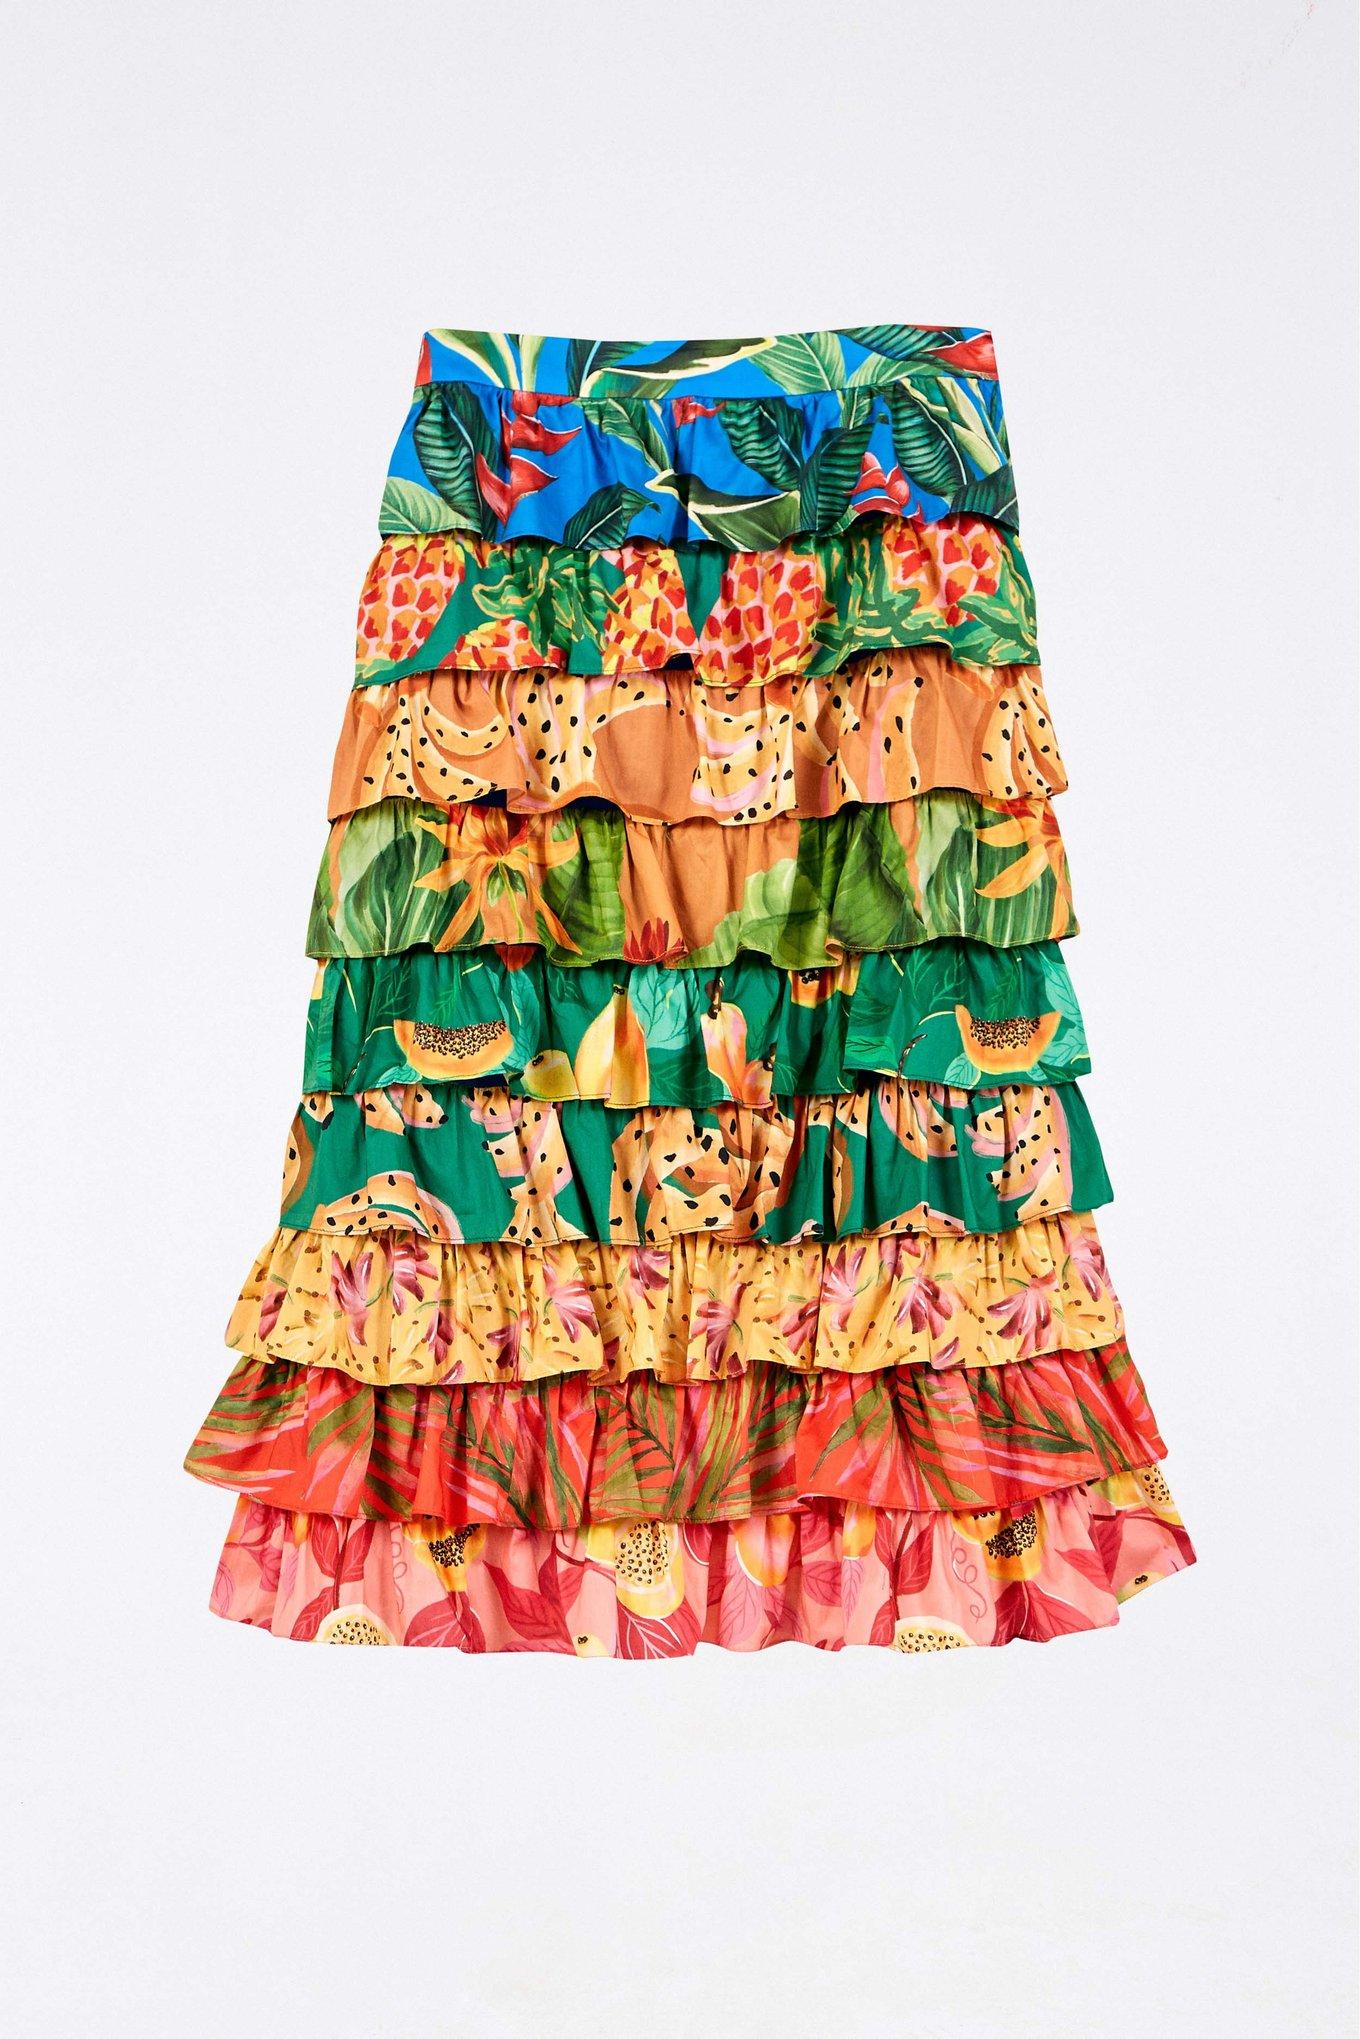 Mixed Prints Multi Layered Midi Skirt $195